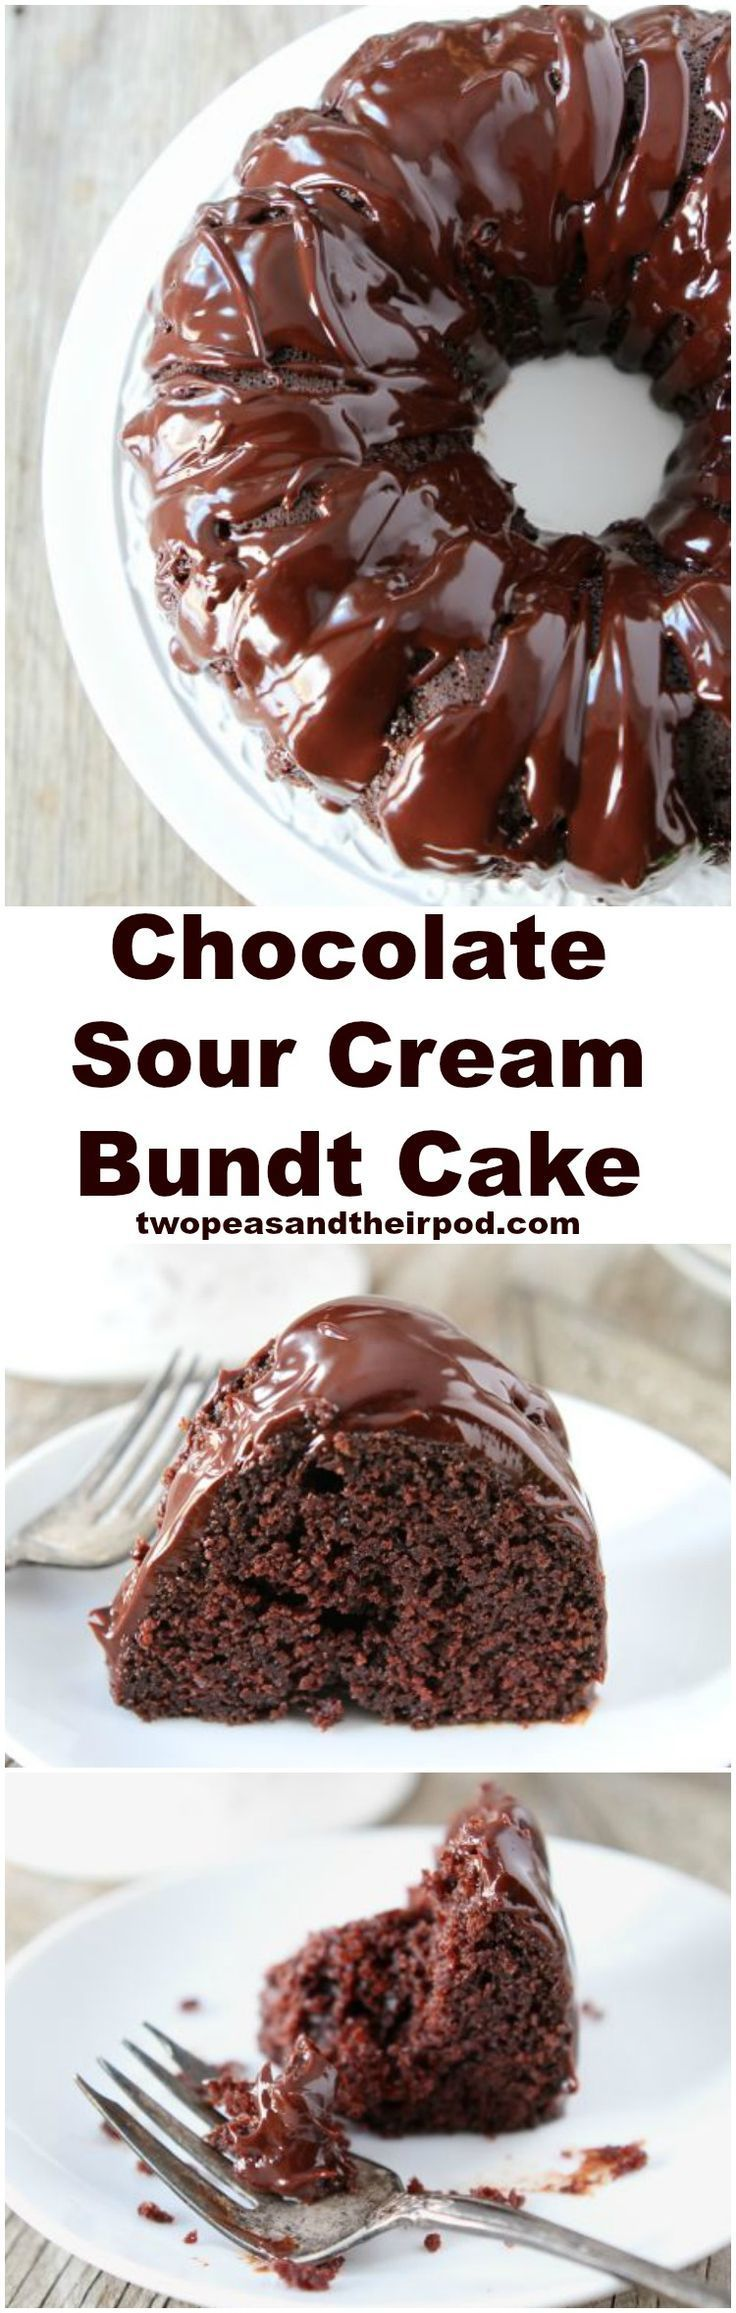 Best 25+ Best chocolates ideas on Pinterest   Chocolate cake, Best ...